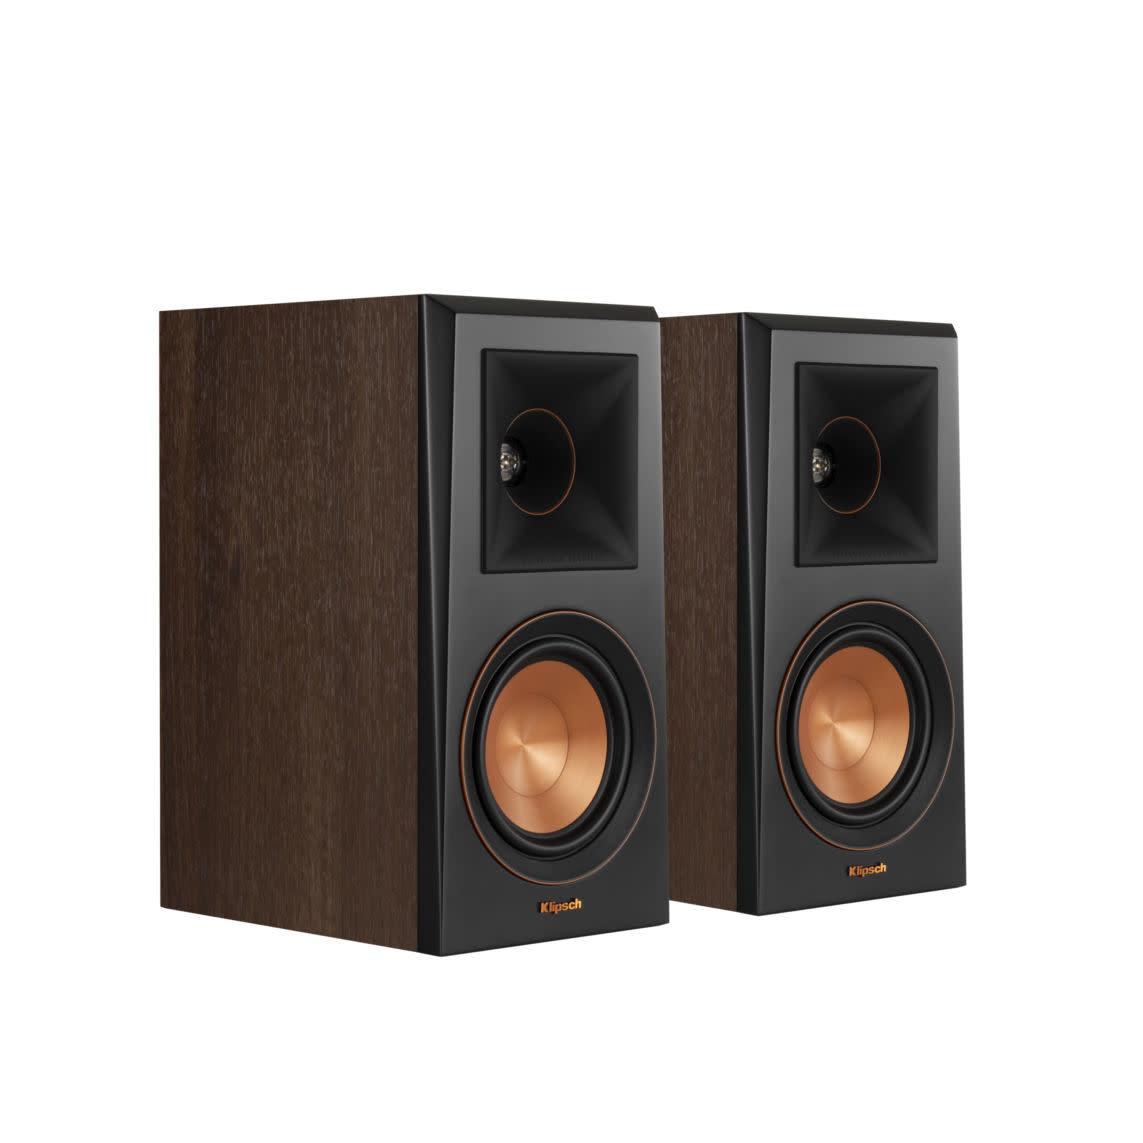 Klipsch Klipsch RP-500M Bookshelf Speakers (Pair)